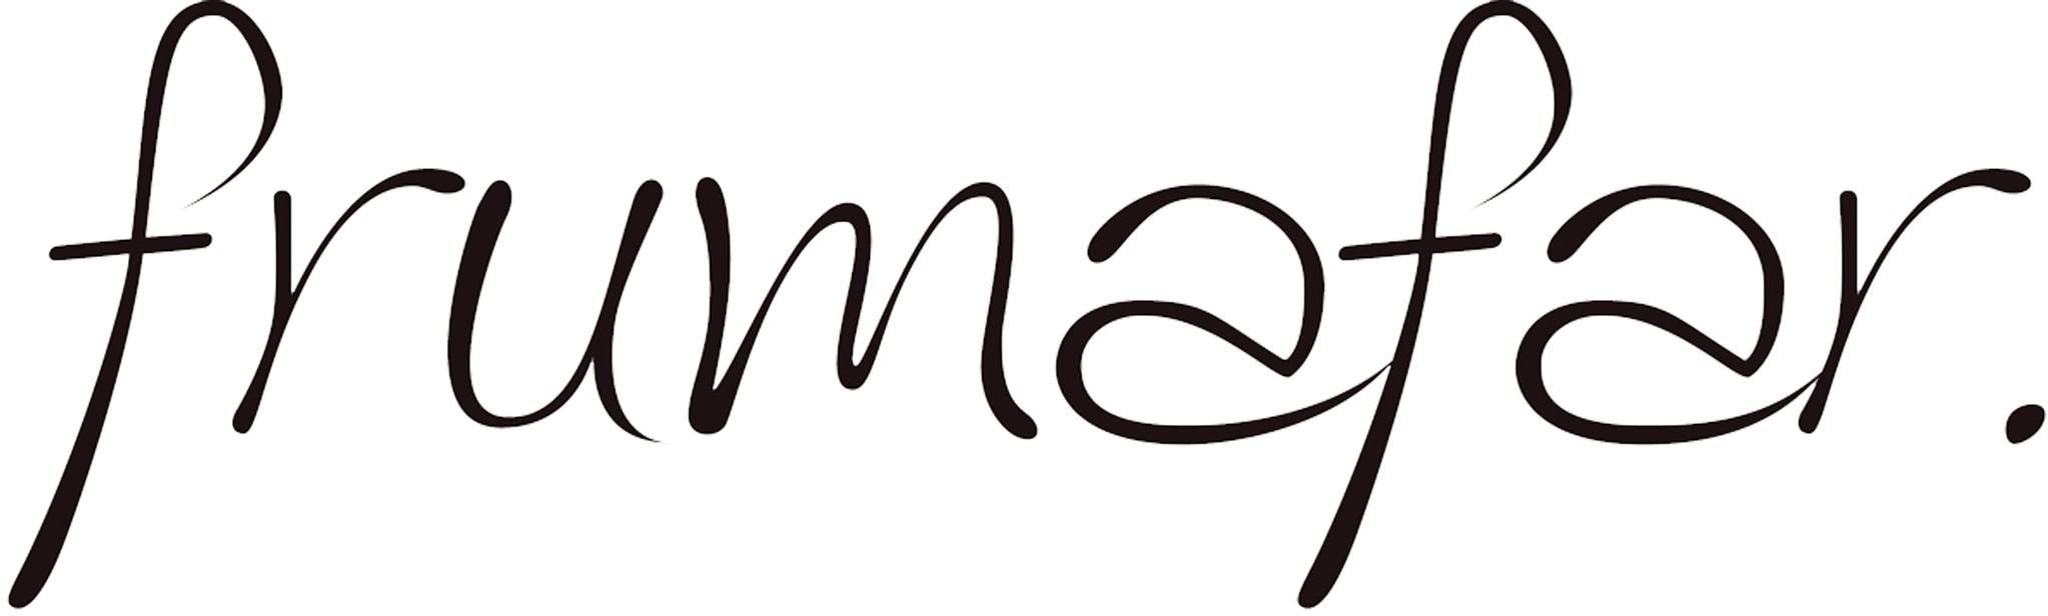 frumafar. (フラマファー) テキスタイルデザイン・original design fabrics